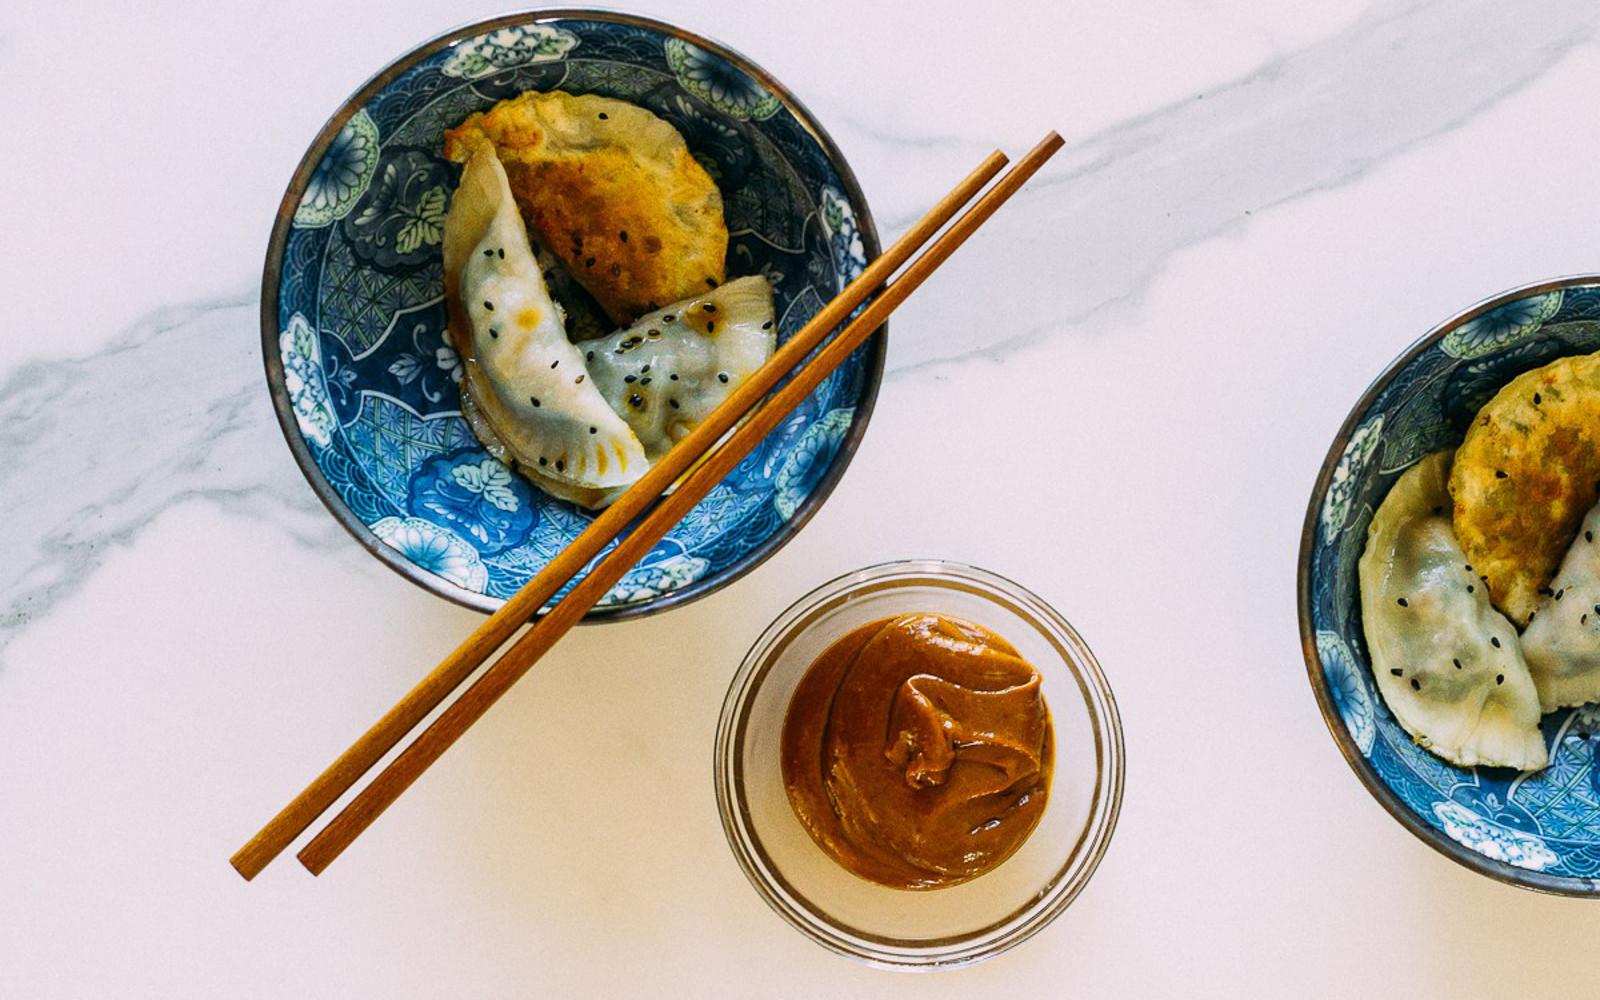 Vegan Mushroom and Vegetable Dumplings